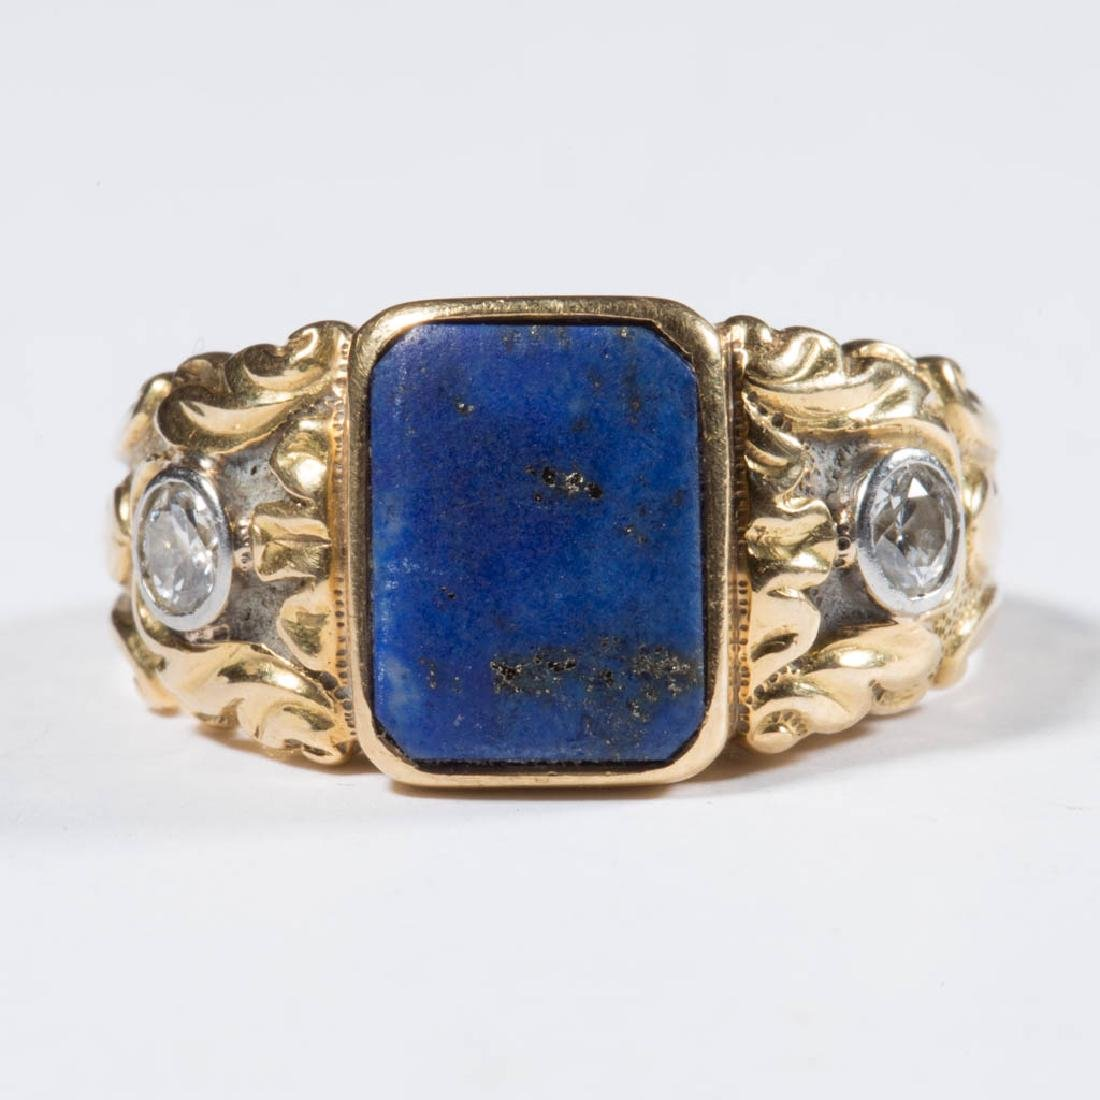 VINTAGE 14K GOLD AND DIAMOND MAN'S RING